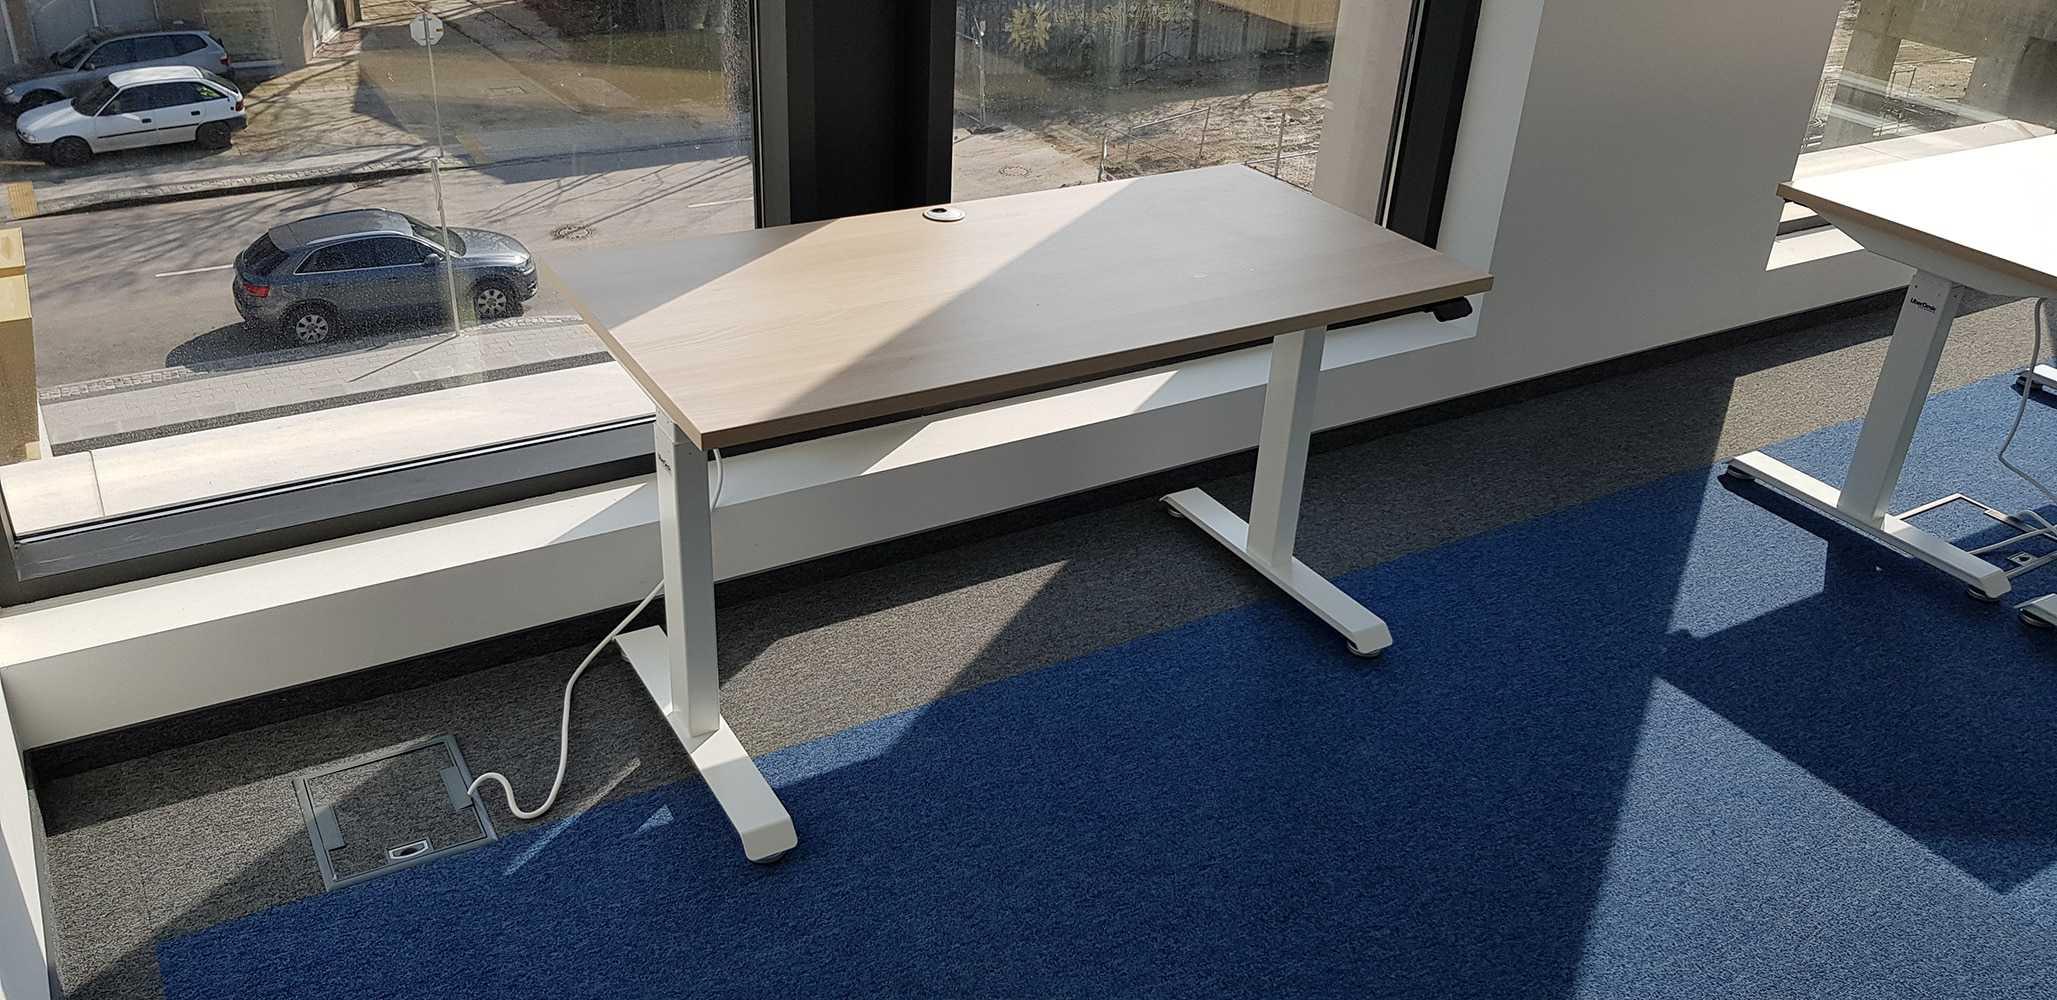 Sit-stand desk BulDesk Pro White legs ad Acacia Worktop